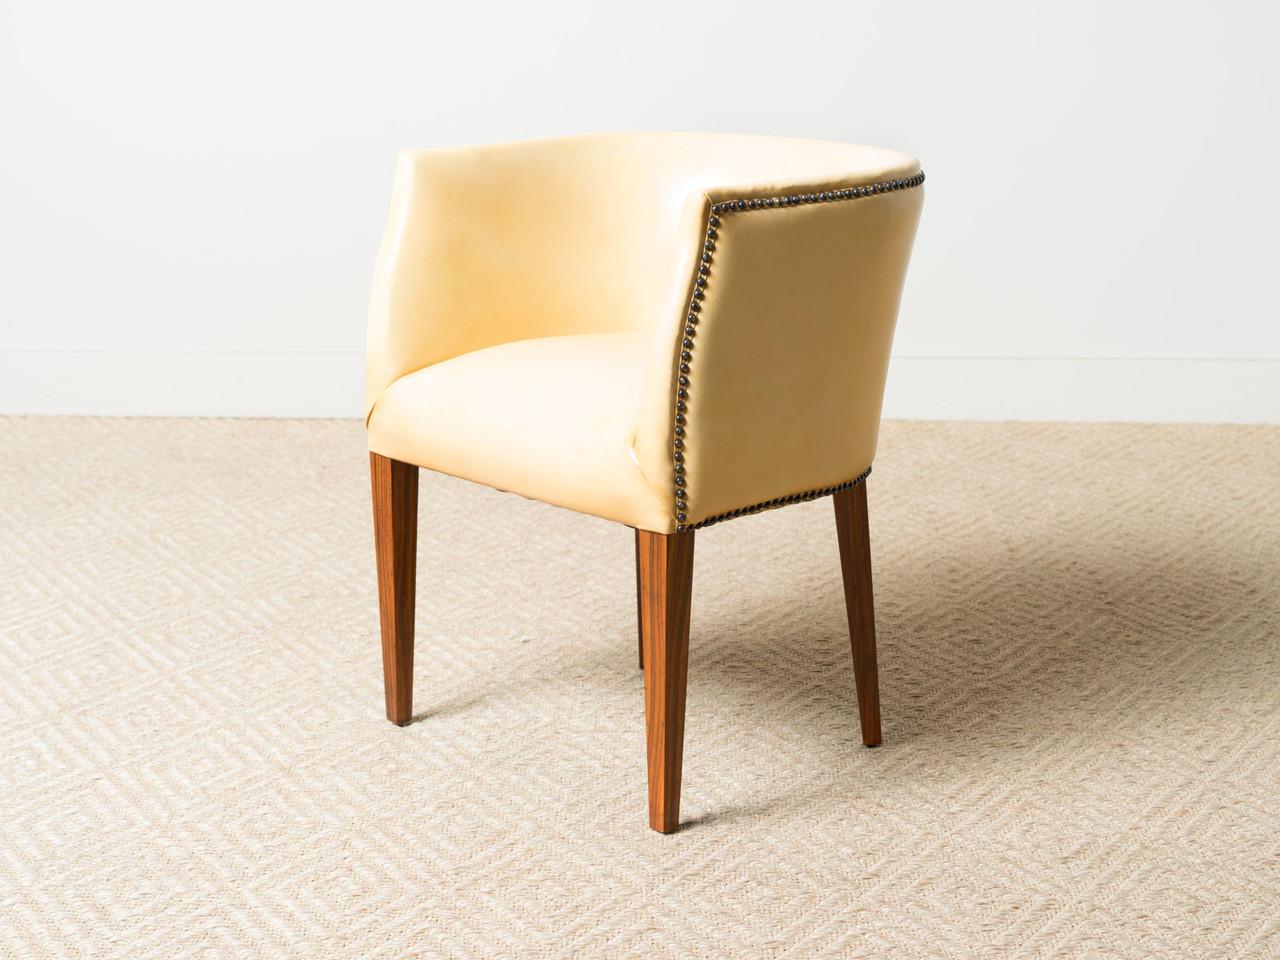 ivory leather barrel chair r e v i v a l